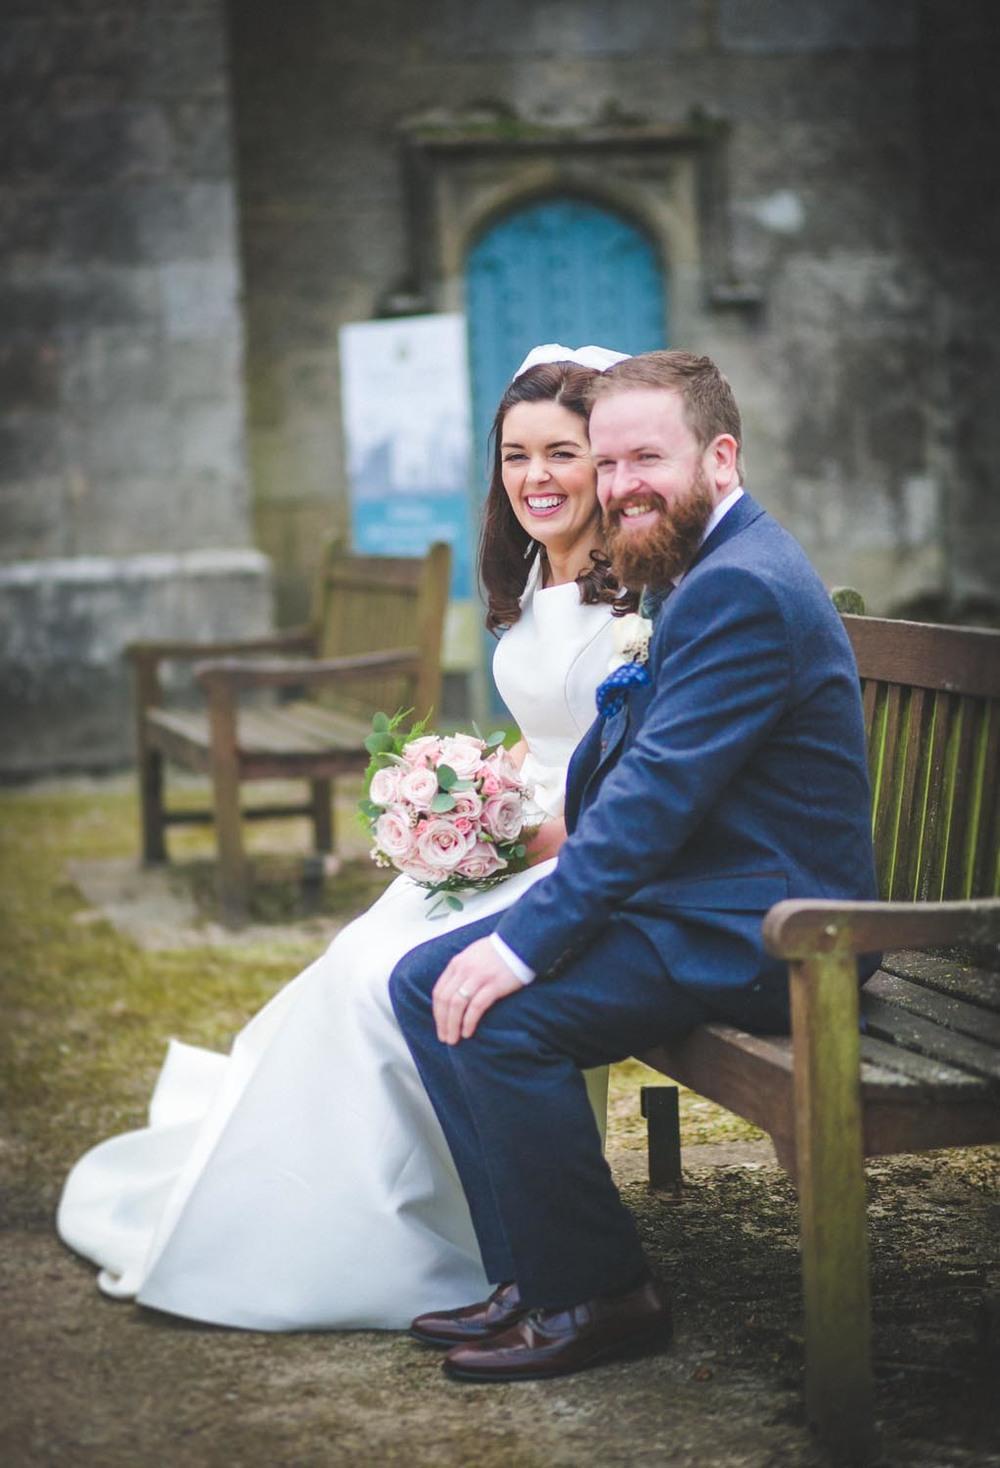 Step House wedding photographer Carlow Borris084.jpg